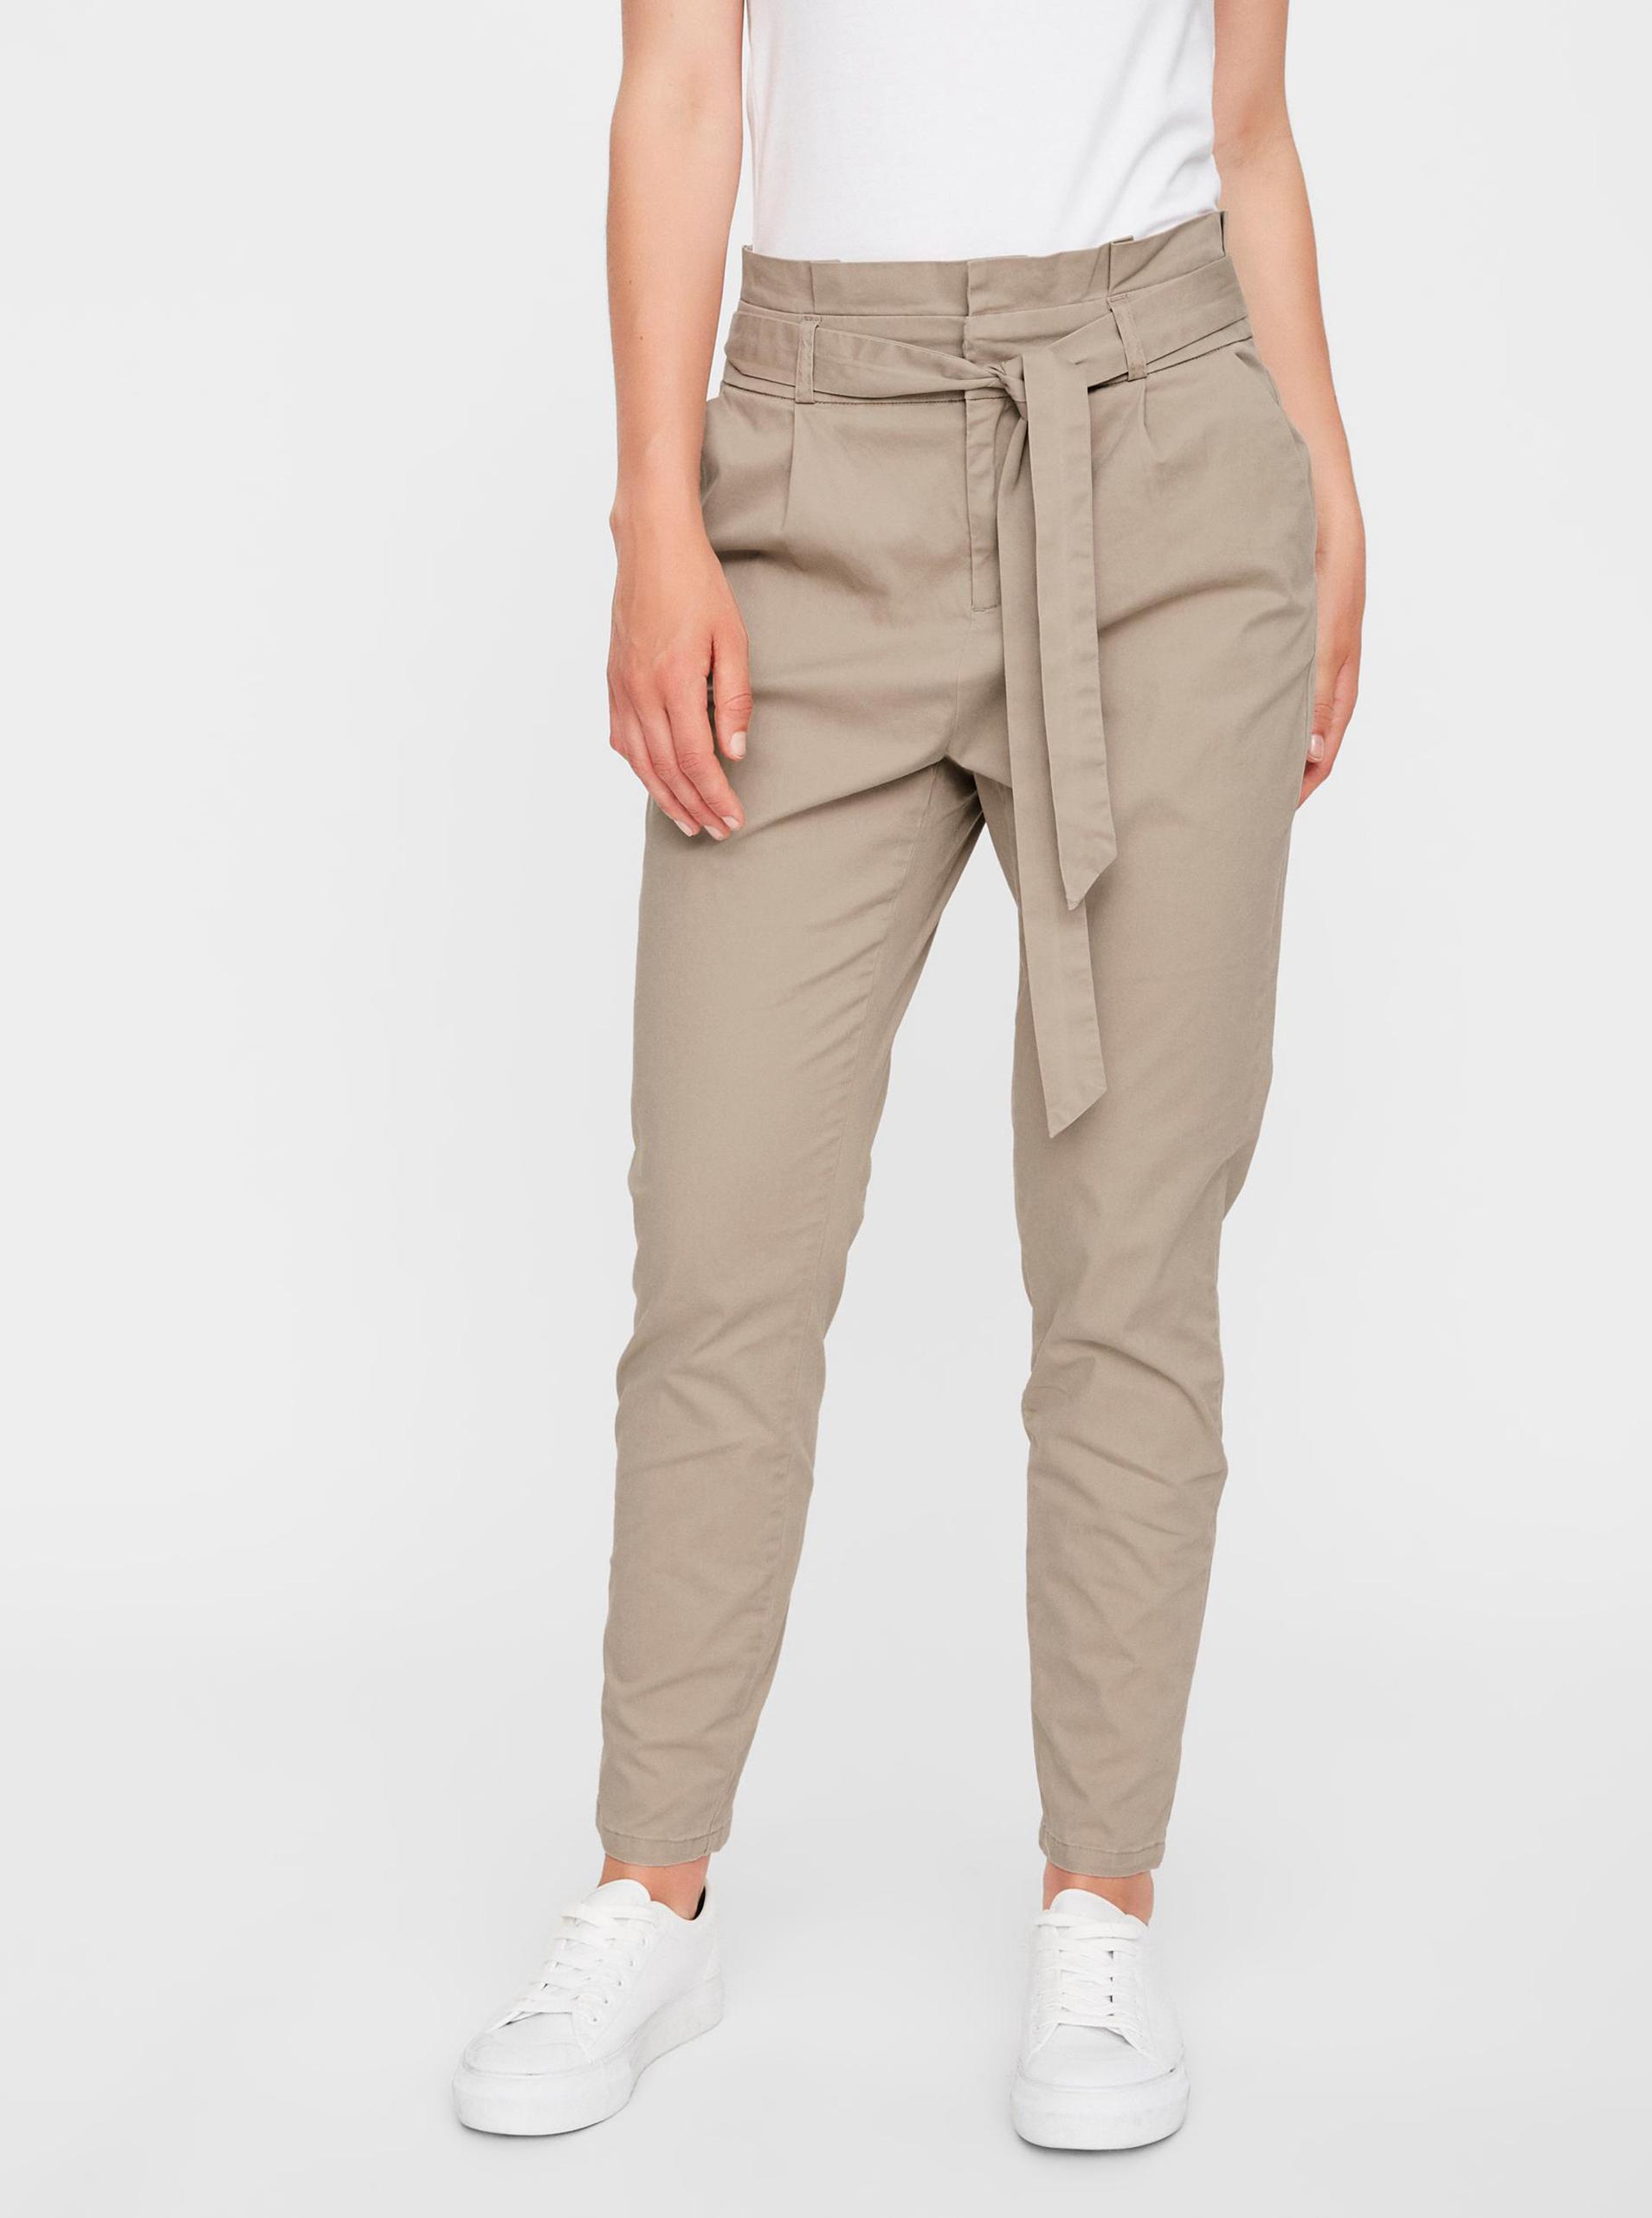 Vero Moda béžové nohavice Eva - XS